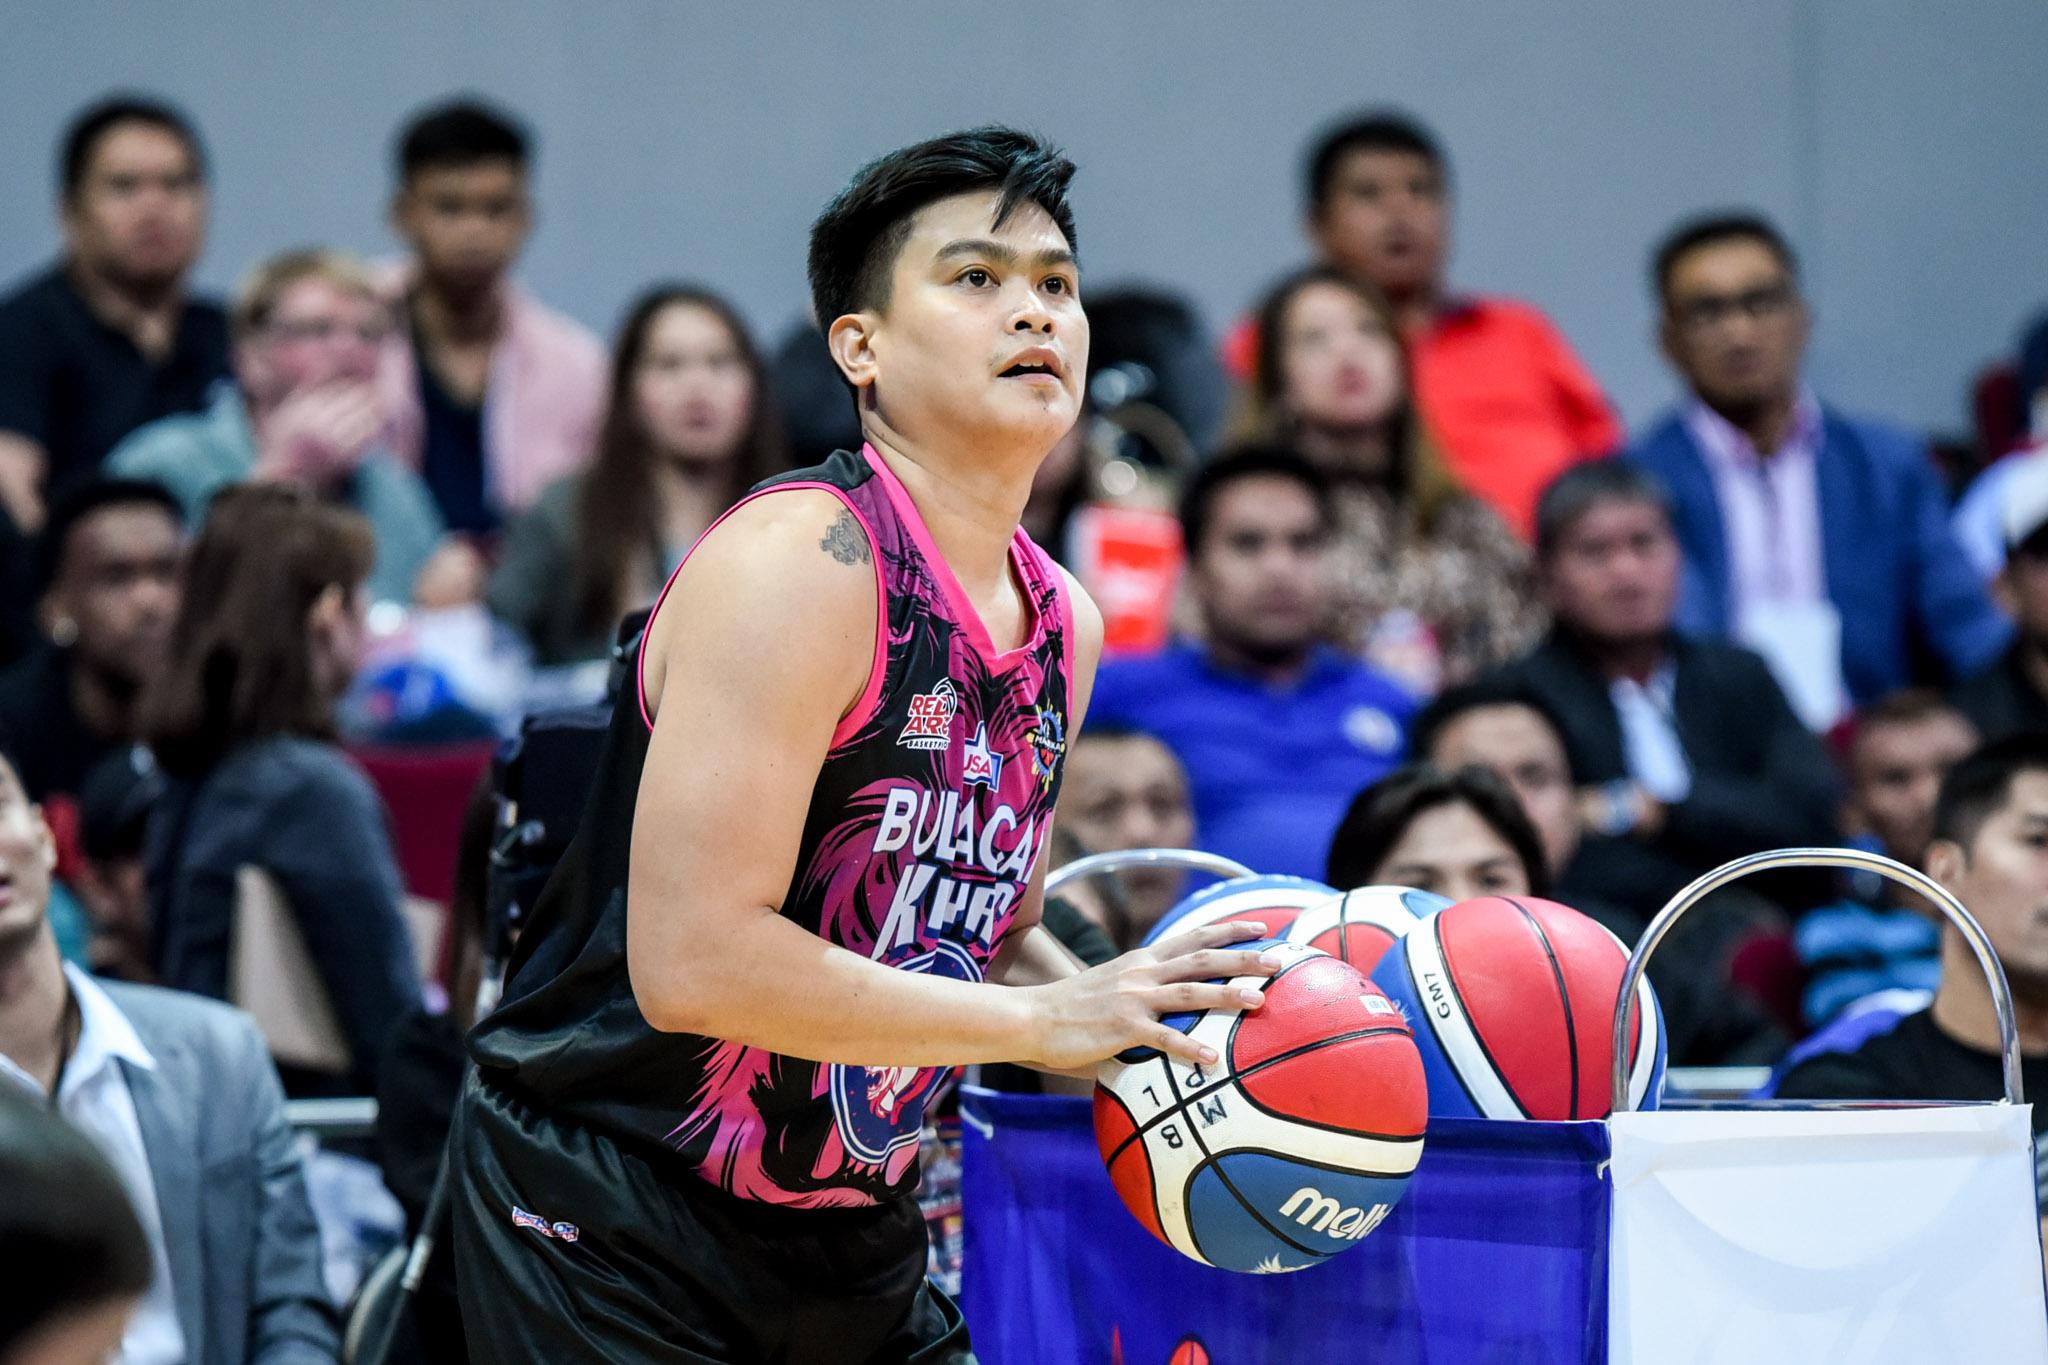 MPBL-2019-2020-AllStarGame-3pt-Shootout-3RD-PHOTO-LESTER-ALVAREZ-BULACAN-KUYAS Lester Alvarez outsnipes James Martinez, rules MPBL Three-point Shootout Uncategorized  - philippine sports news